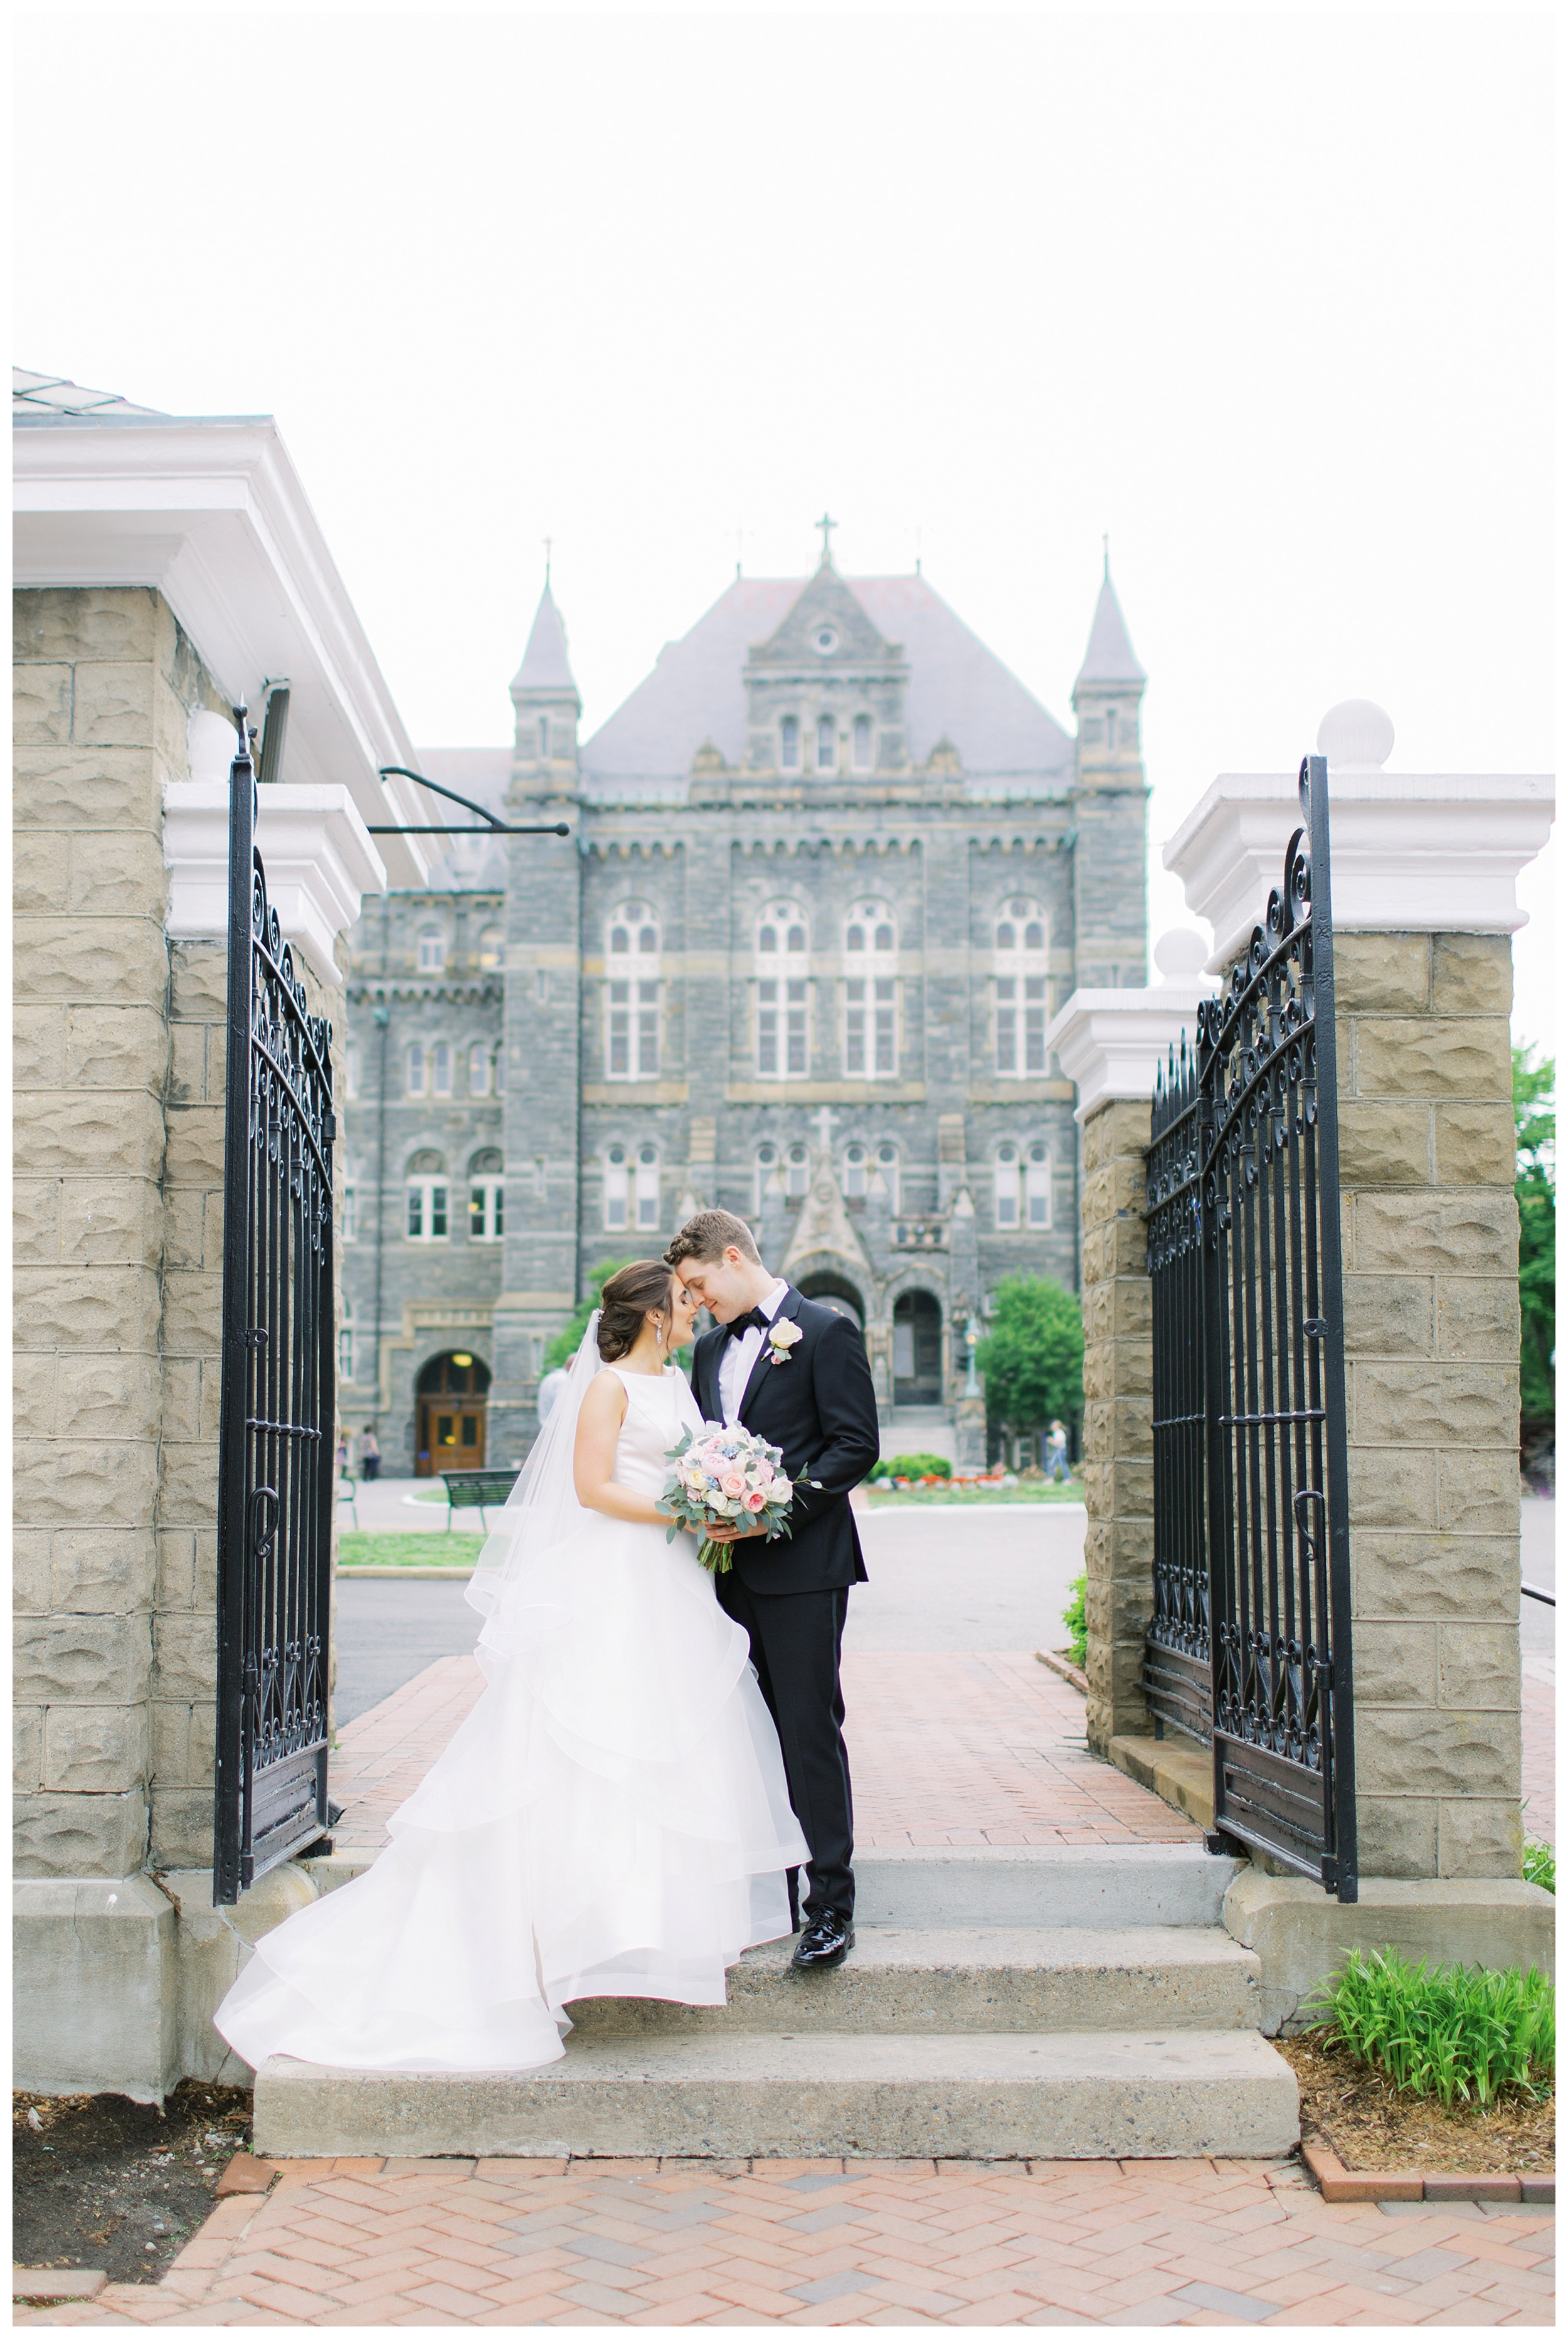 DAR Constitution Hall Wedding Wedding | Daughters of the American Revolution Wedding | District of Columbia Film Wedding Photographer Kir Tuben_0070.jpg